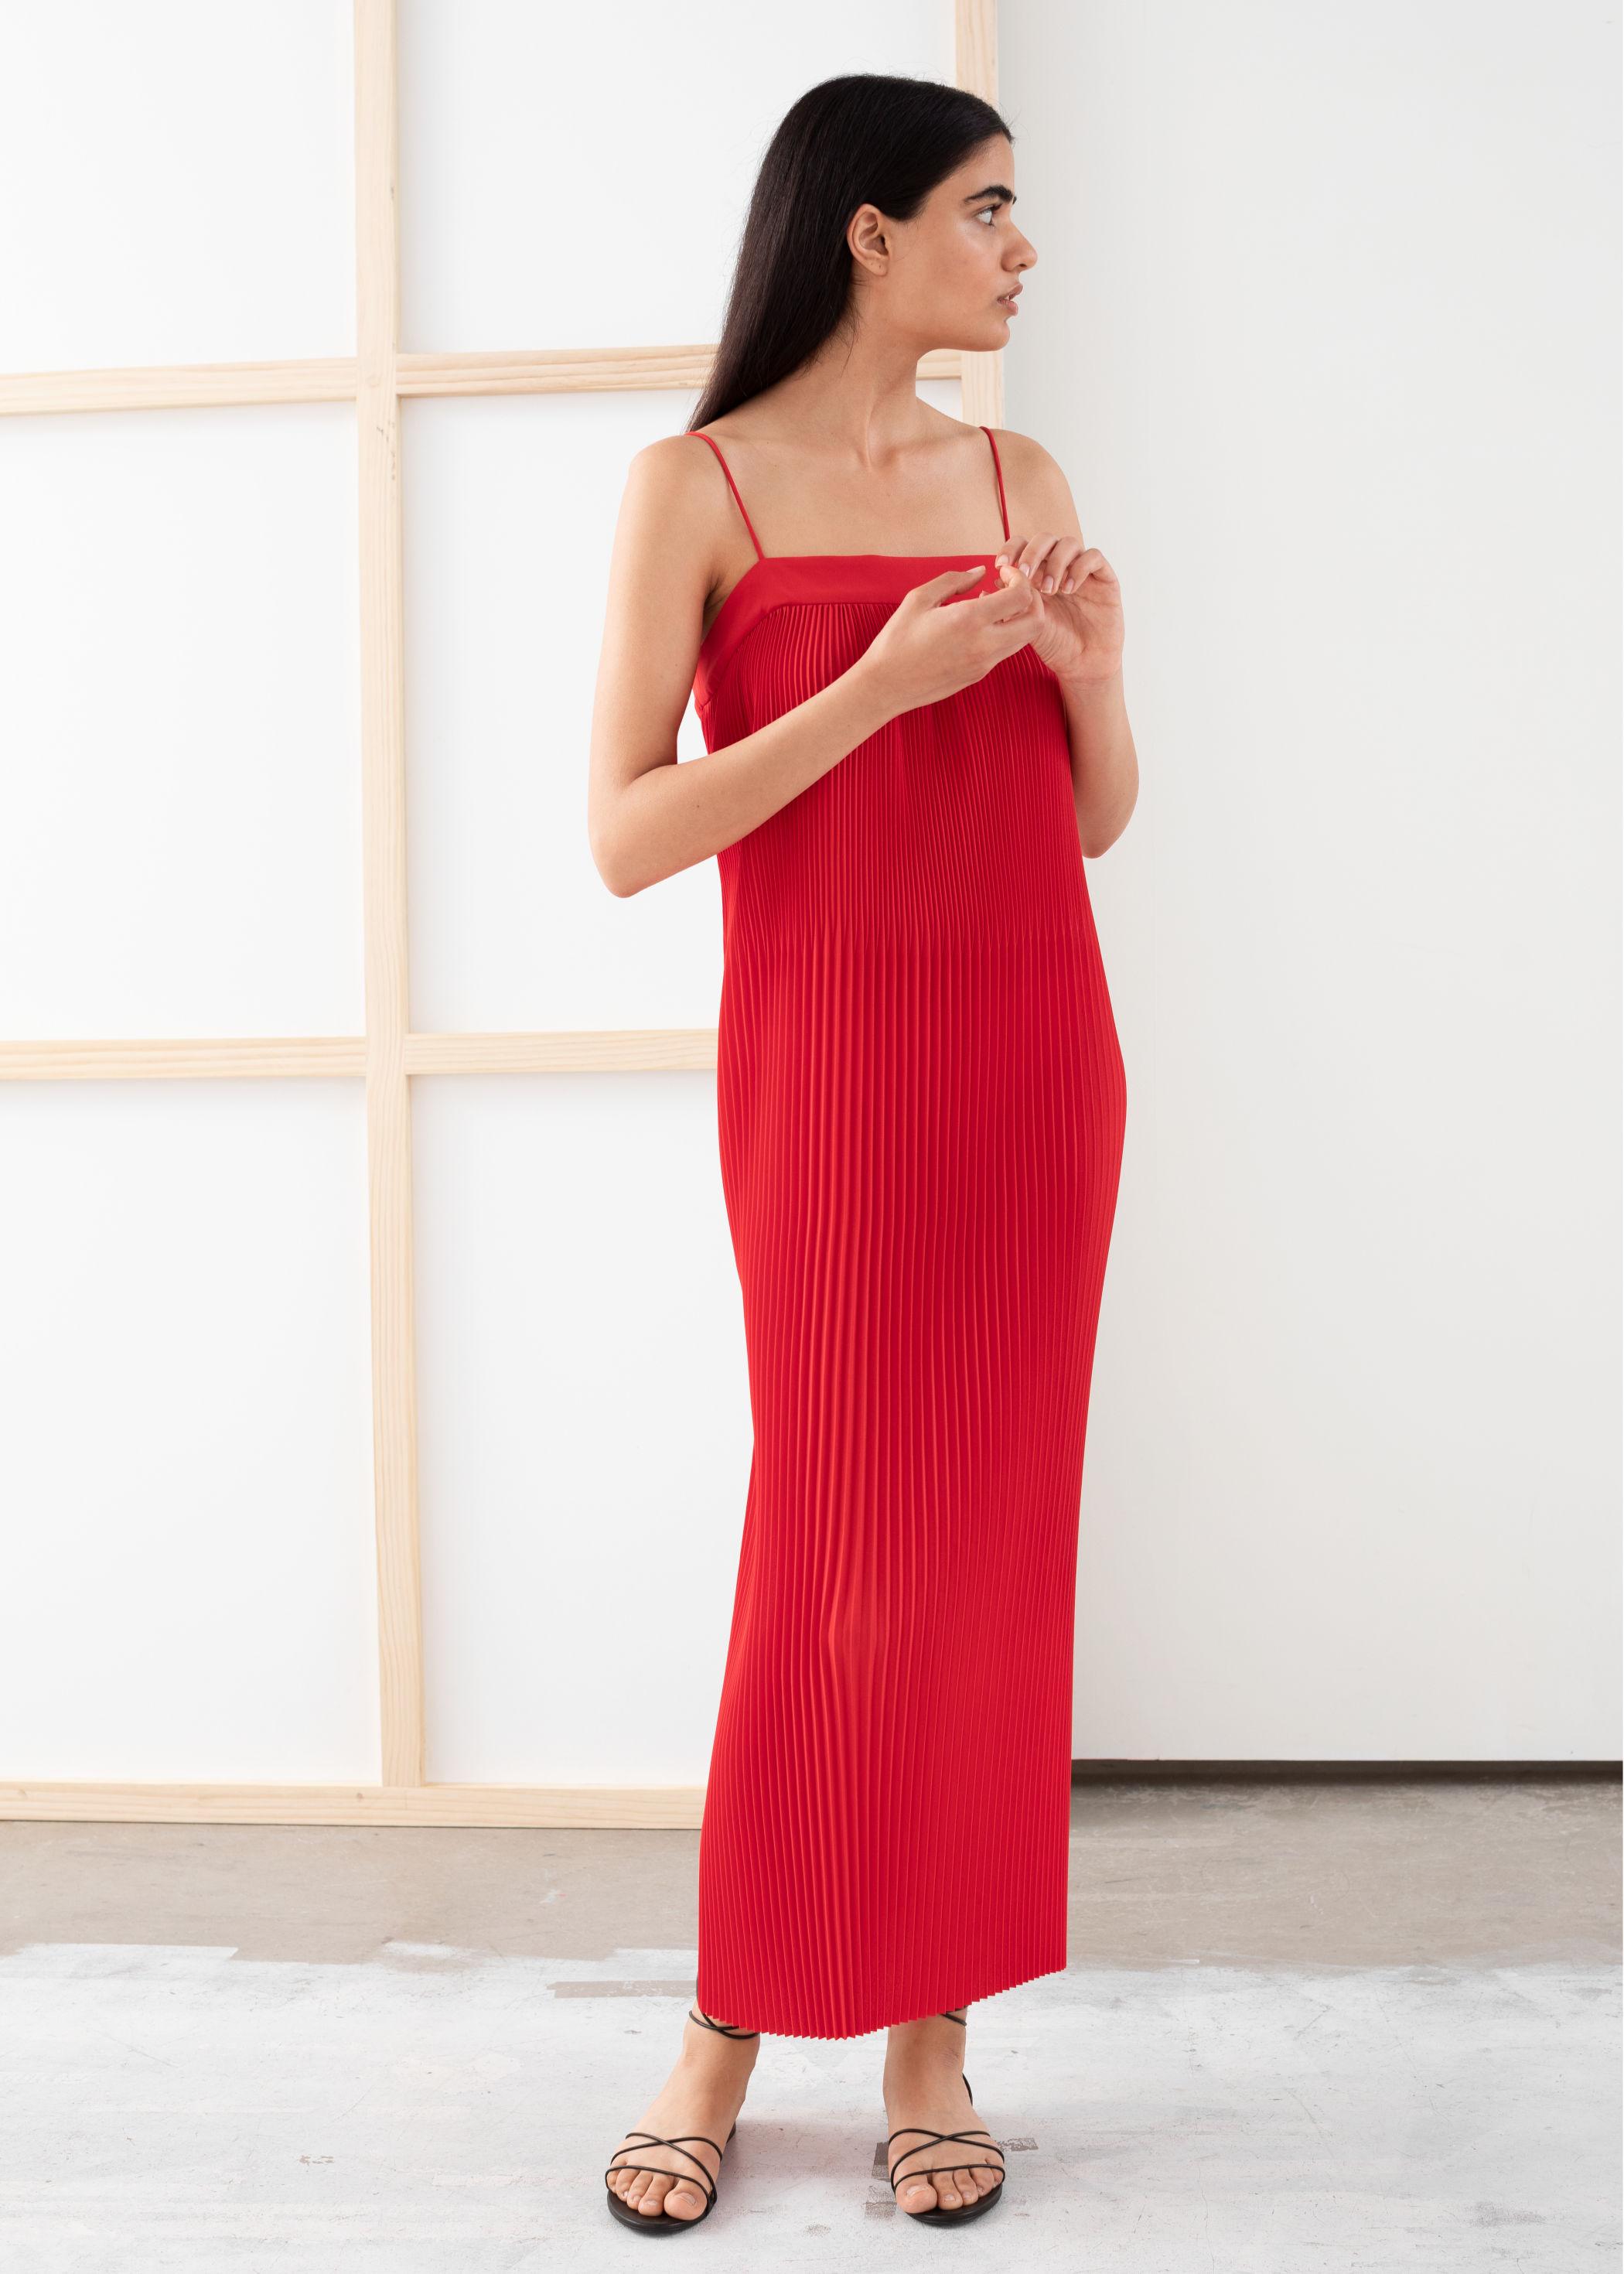 Червена миди рокля плисе &Other Stories, 185лв.